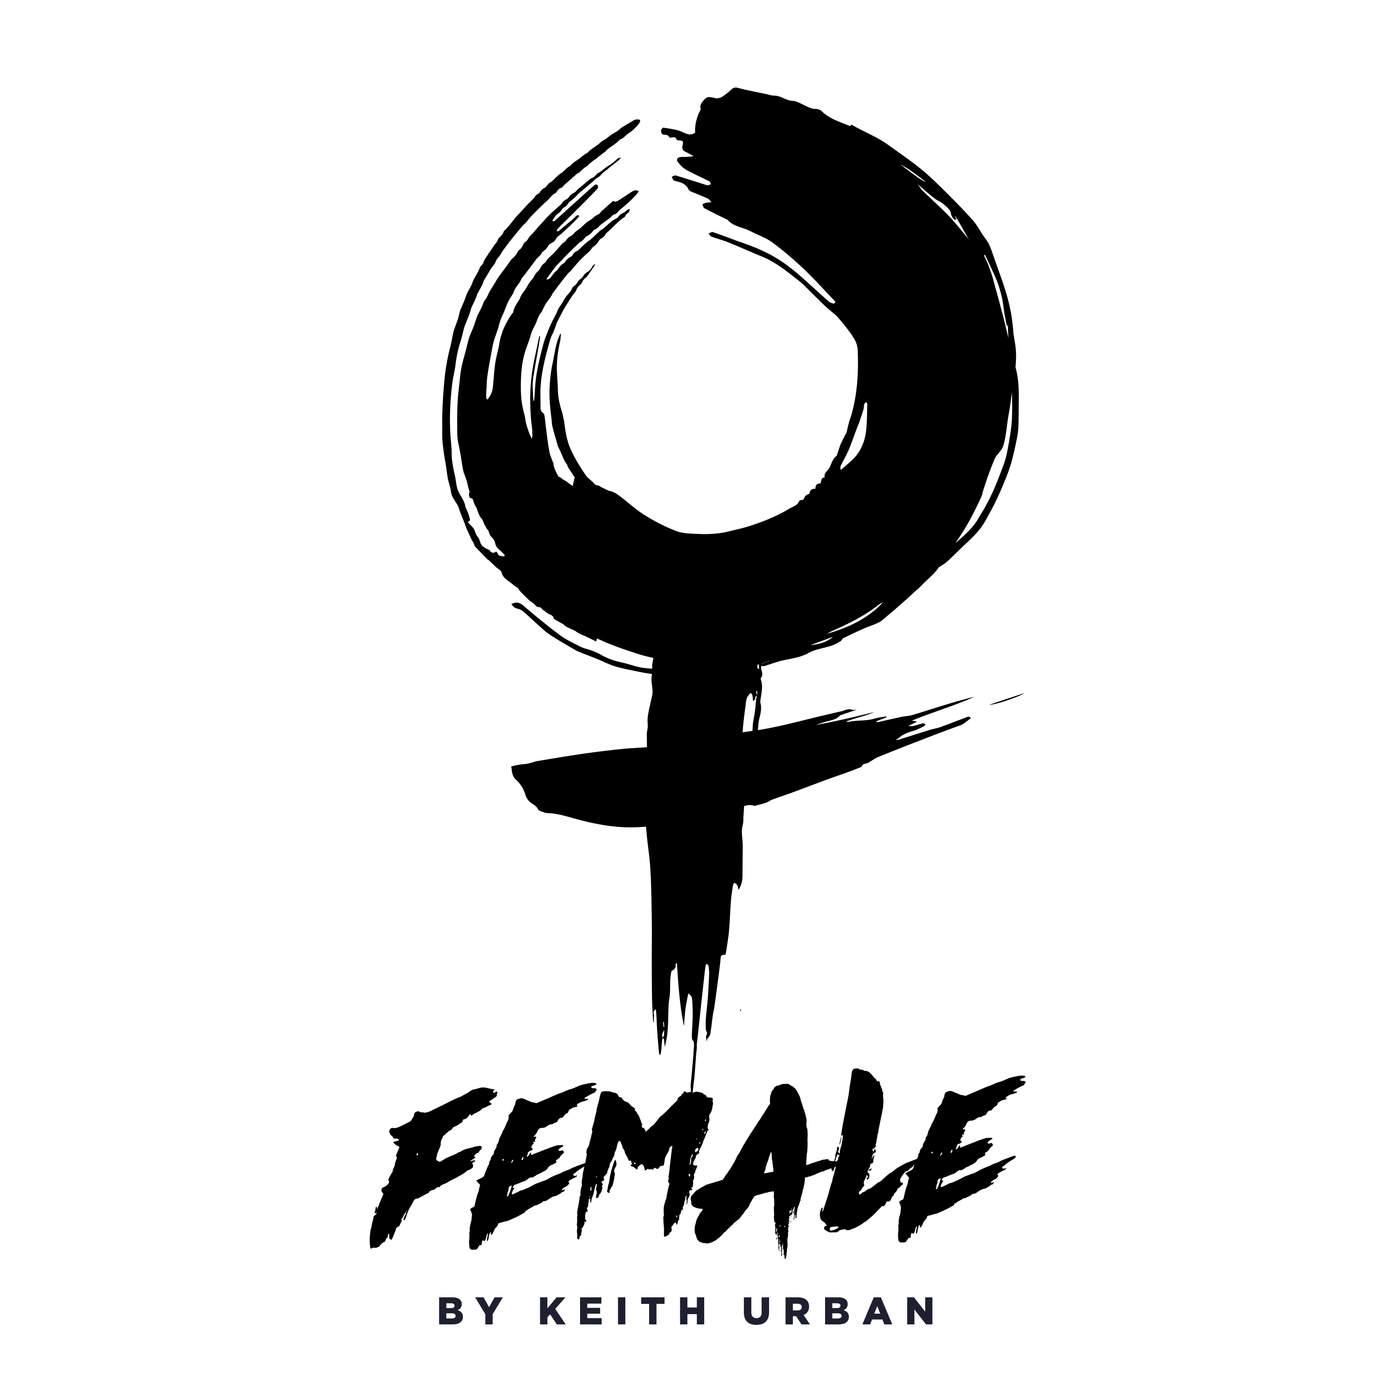 Keith Urban - Female - Single